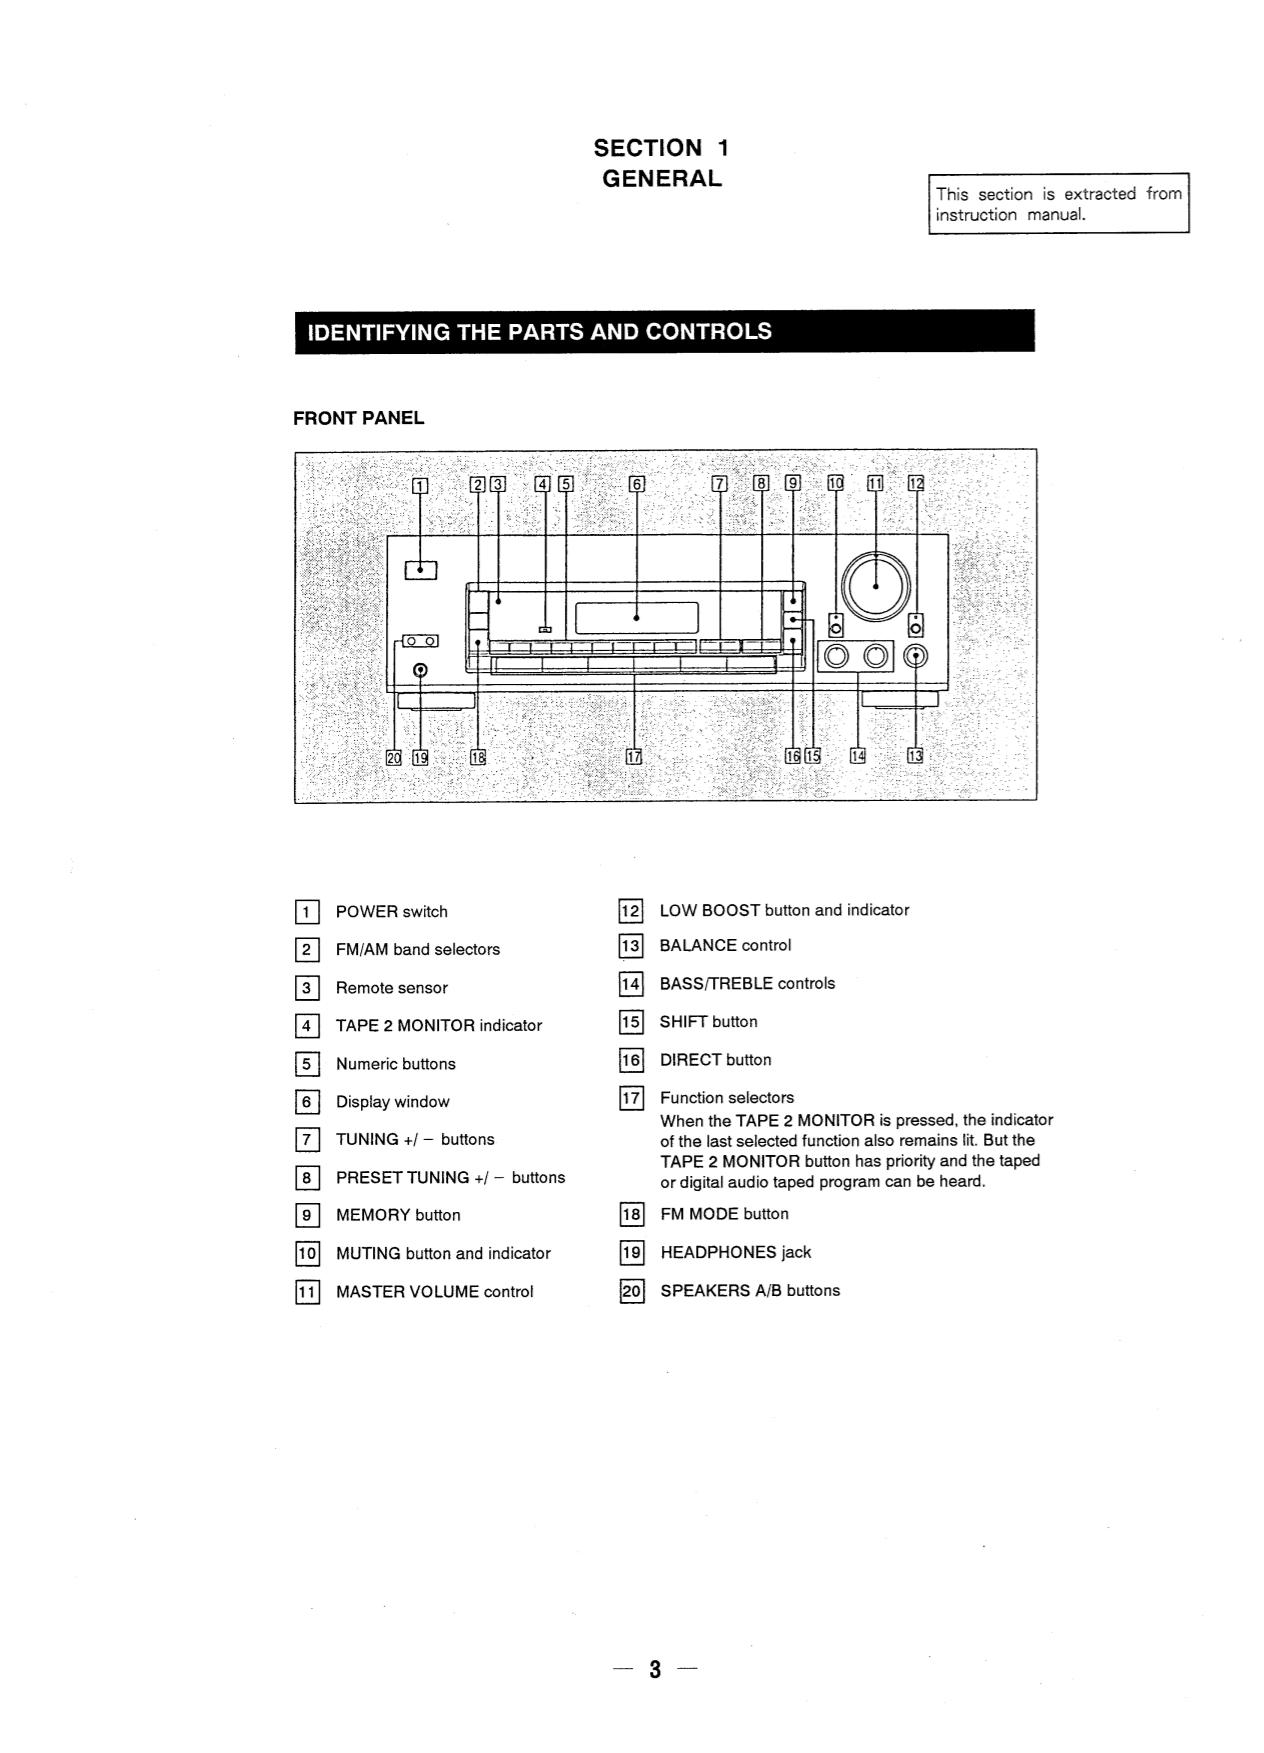 PDF manual for Sony Receiver STR-D315